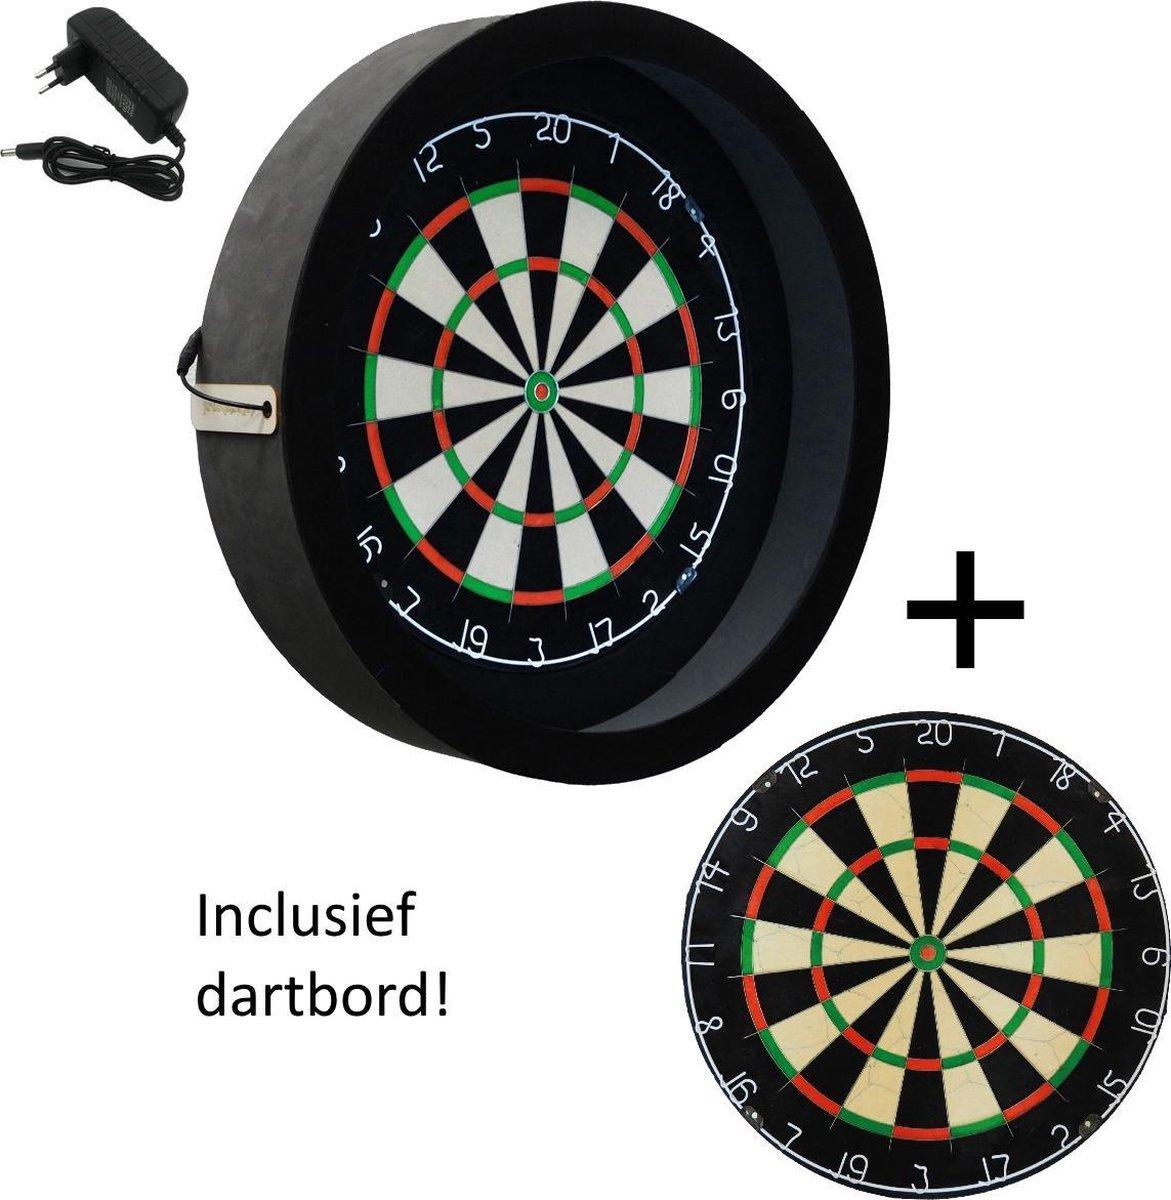 Dragon darts - dartbord verlichting - incl. dartbord - Sorpresa PRO - Zwart - dartbord berscherm ring - dartbord